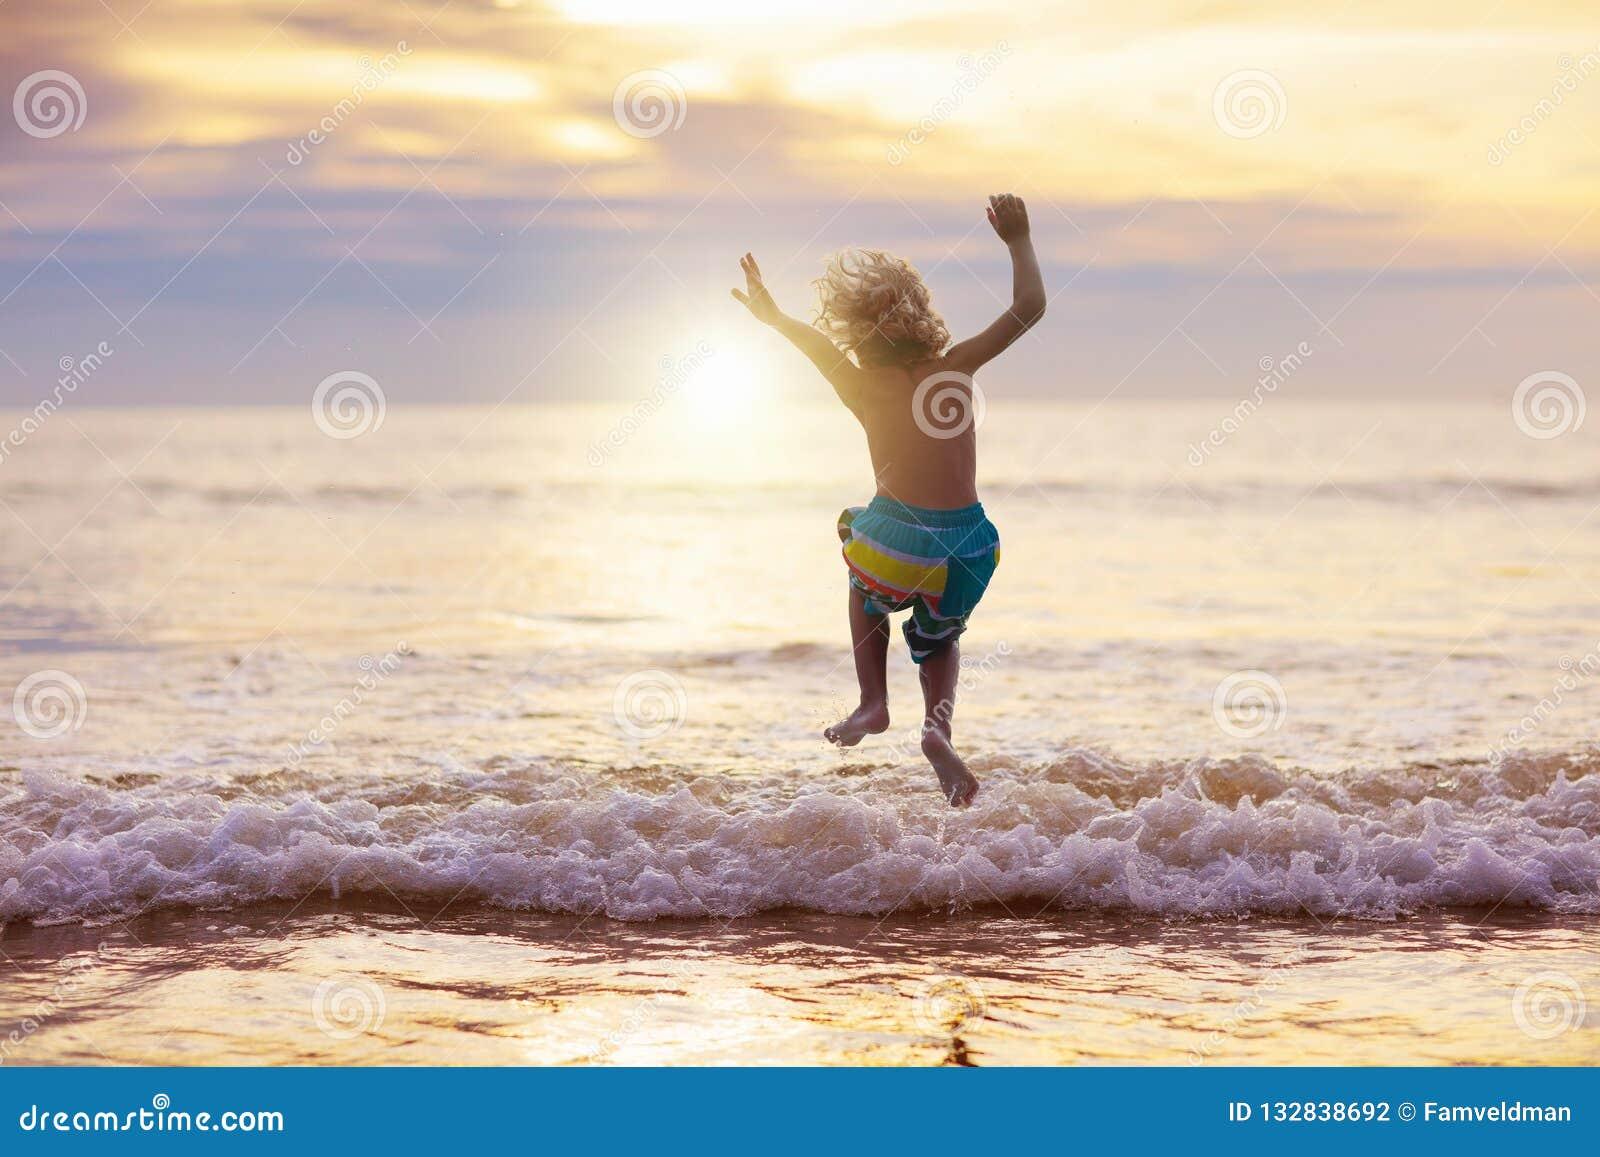 Child playing on ocean beach. Kid at sunset sea